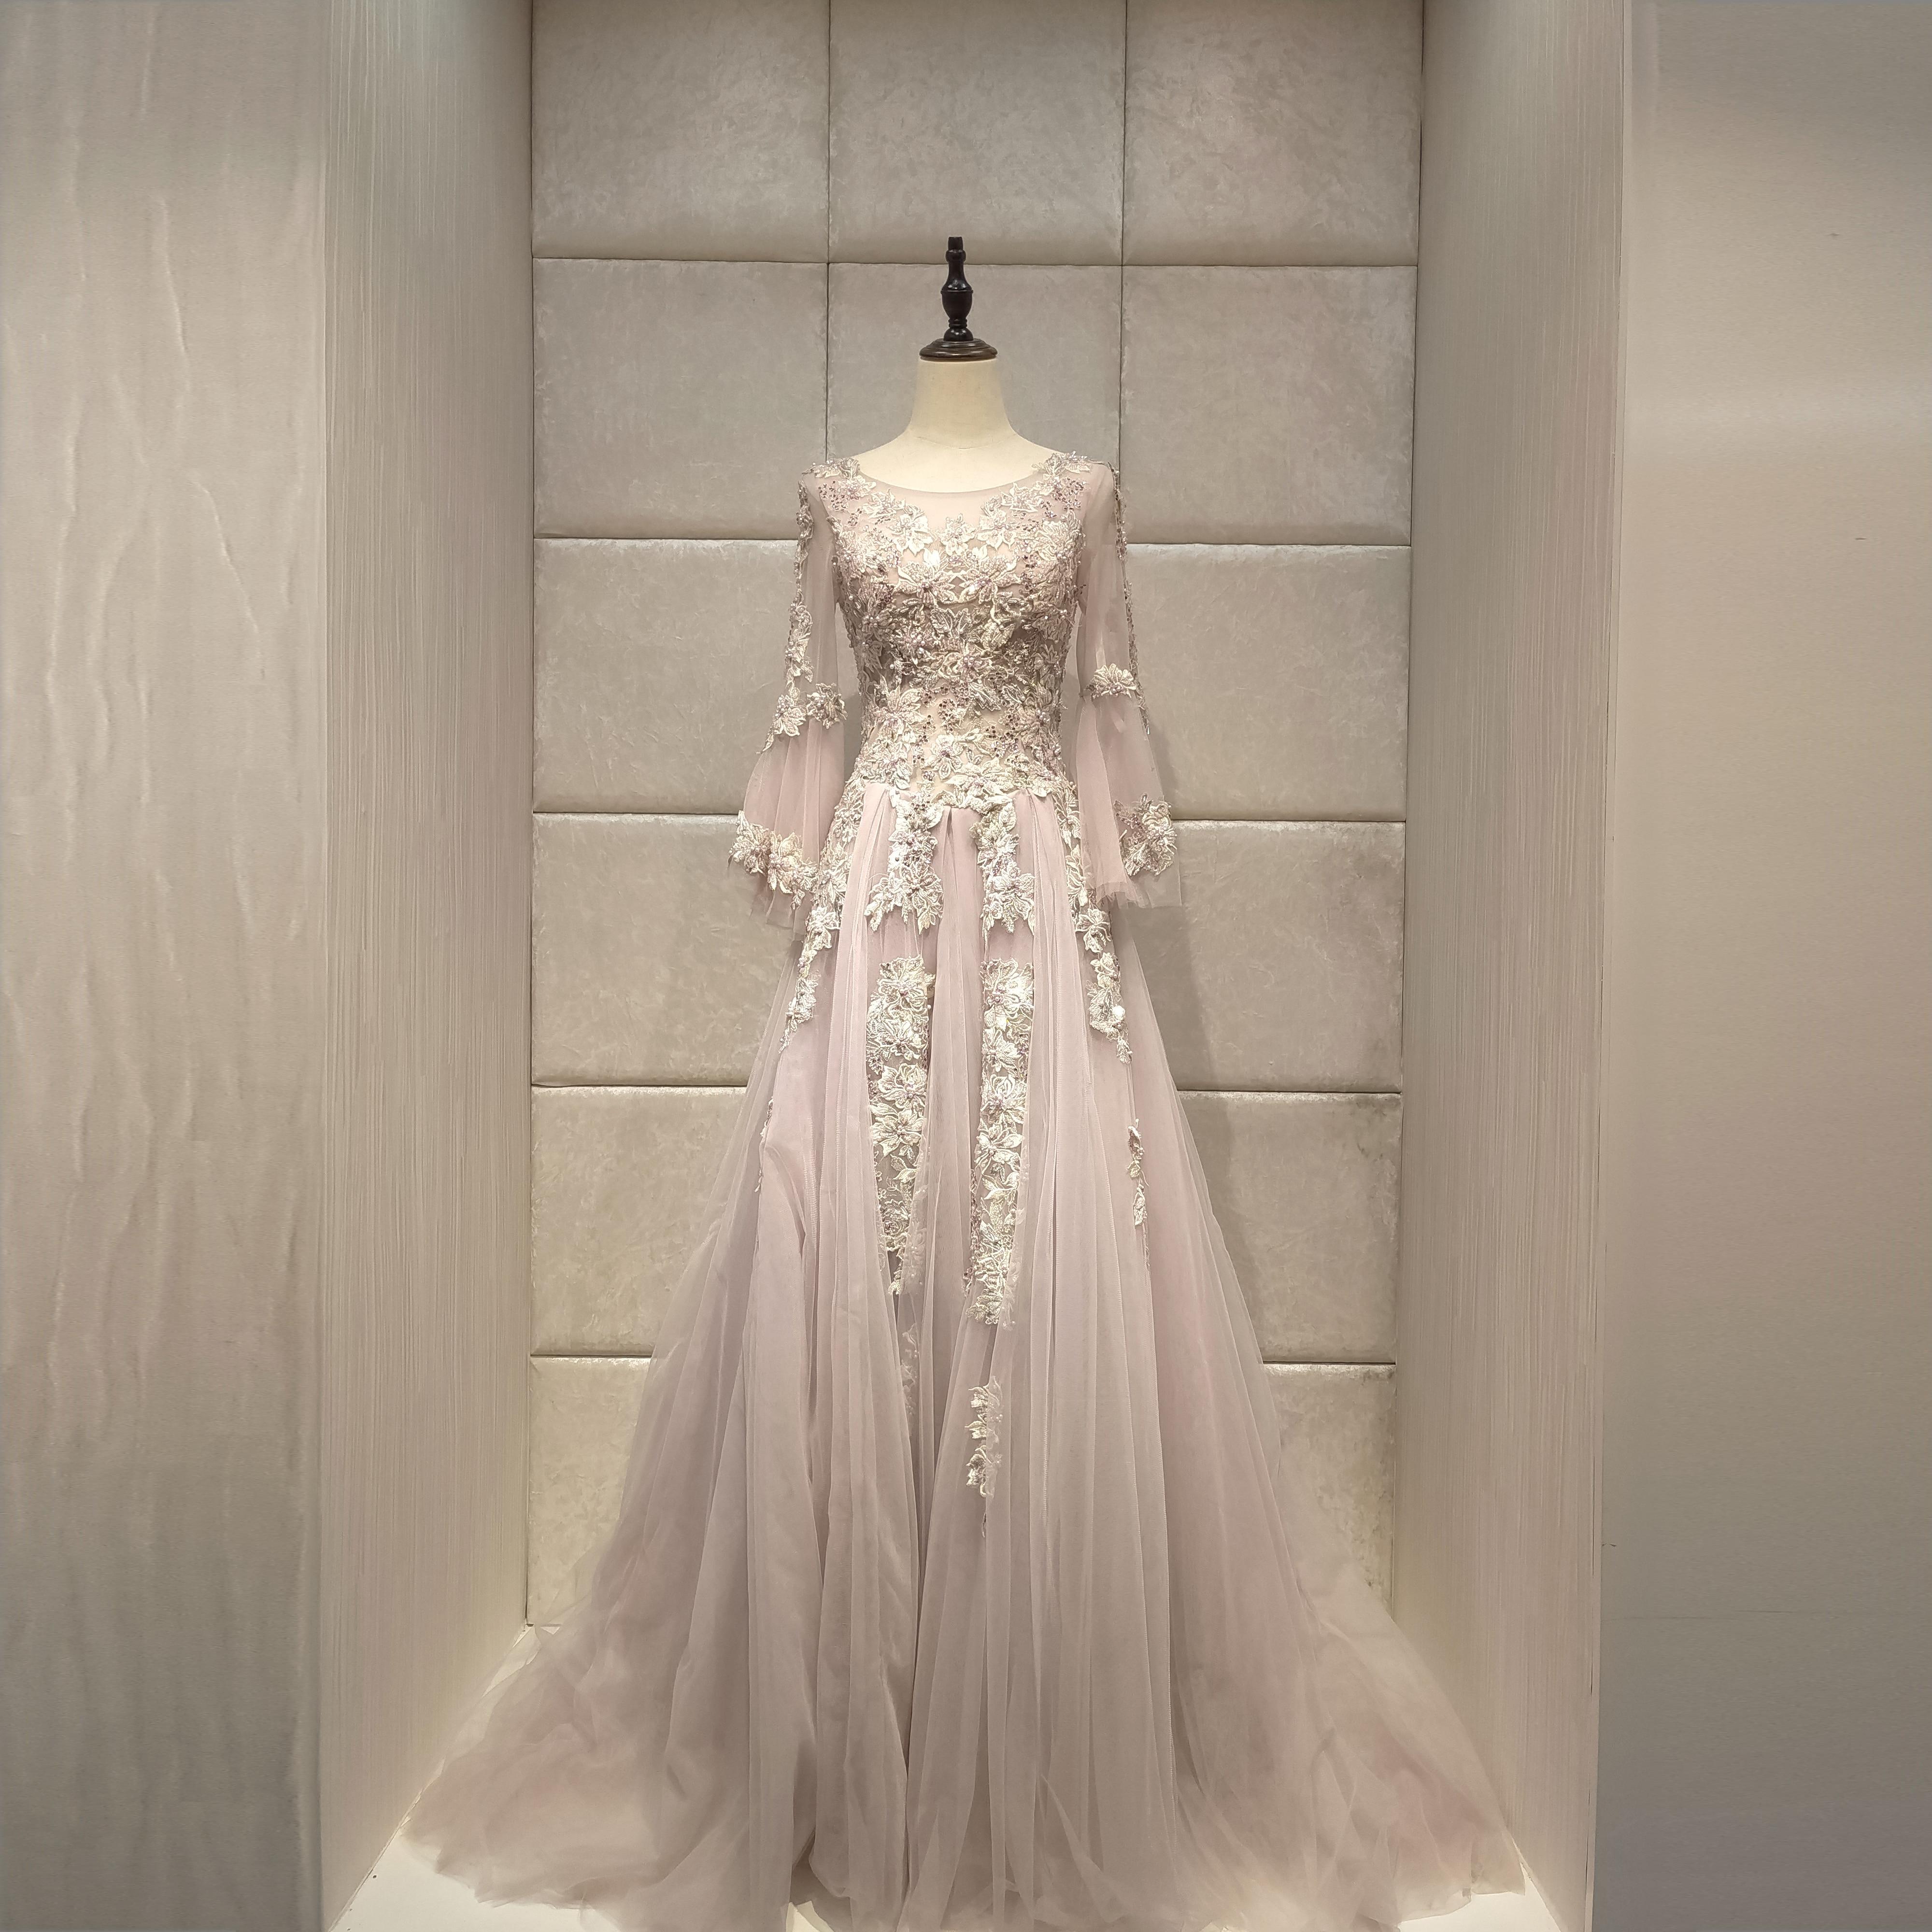 US $18.18 18% OFFElegant Princess evening dresses 18new vestido de  noiva abendkleider robe de soiree long dressEvening Dresses - AliExpress